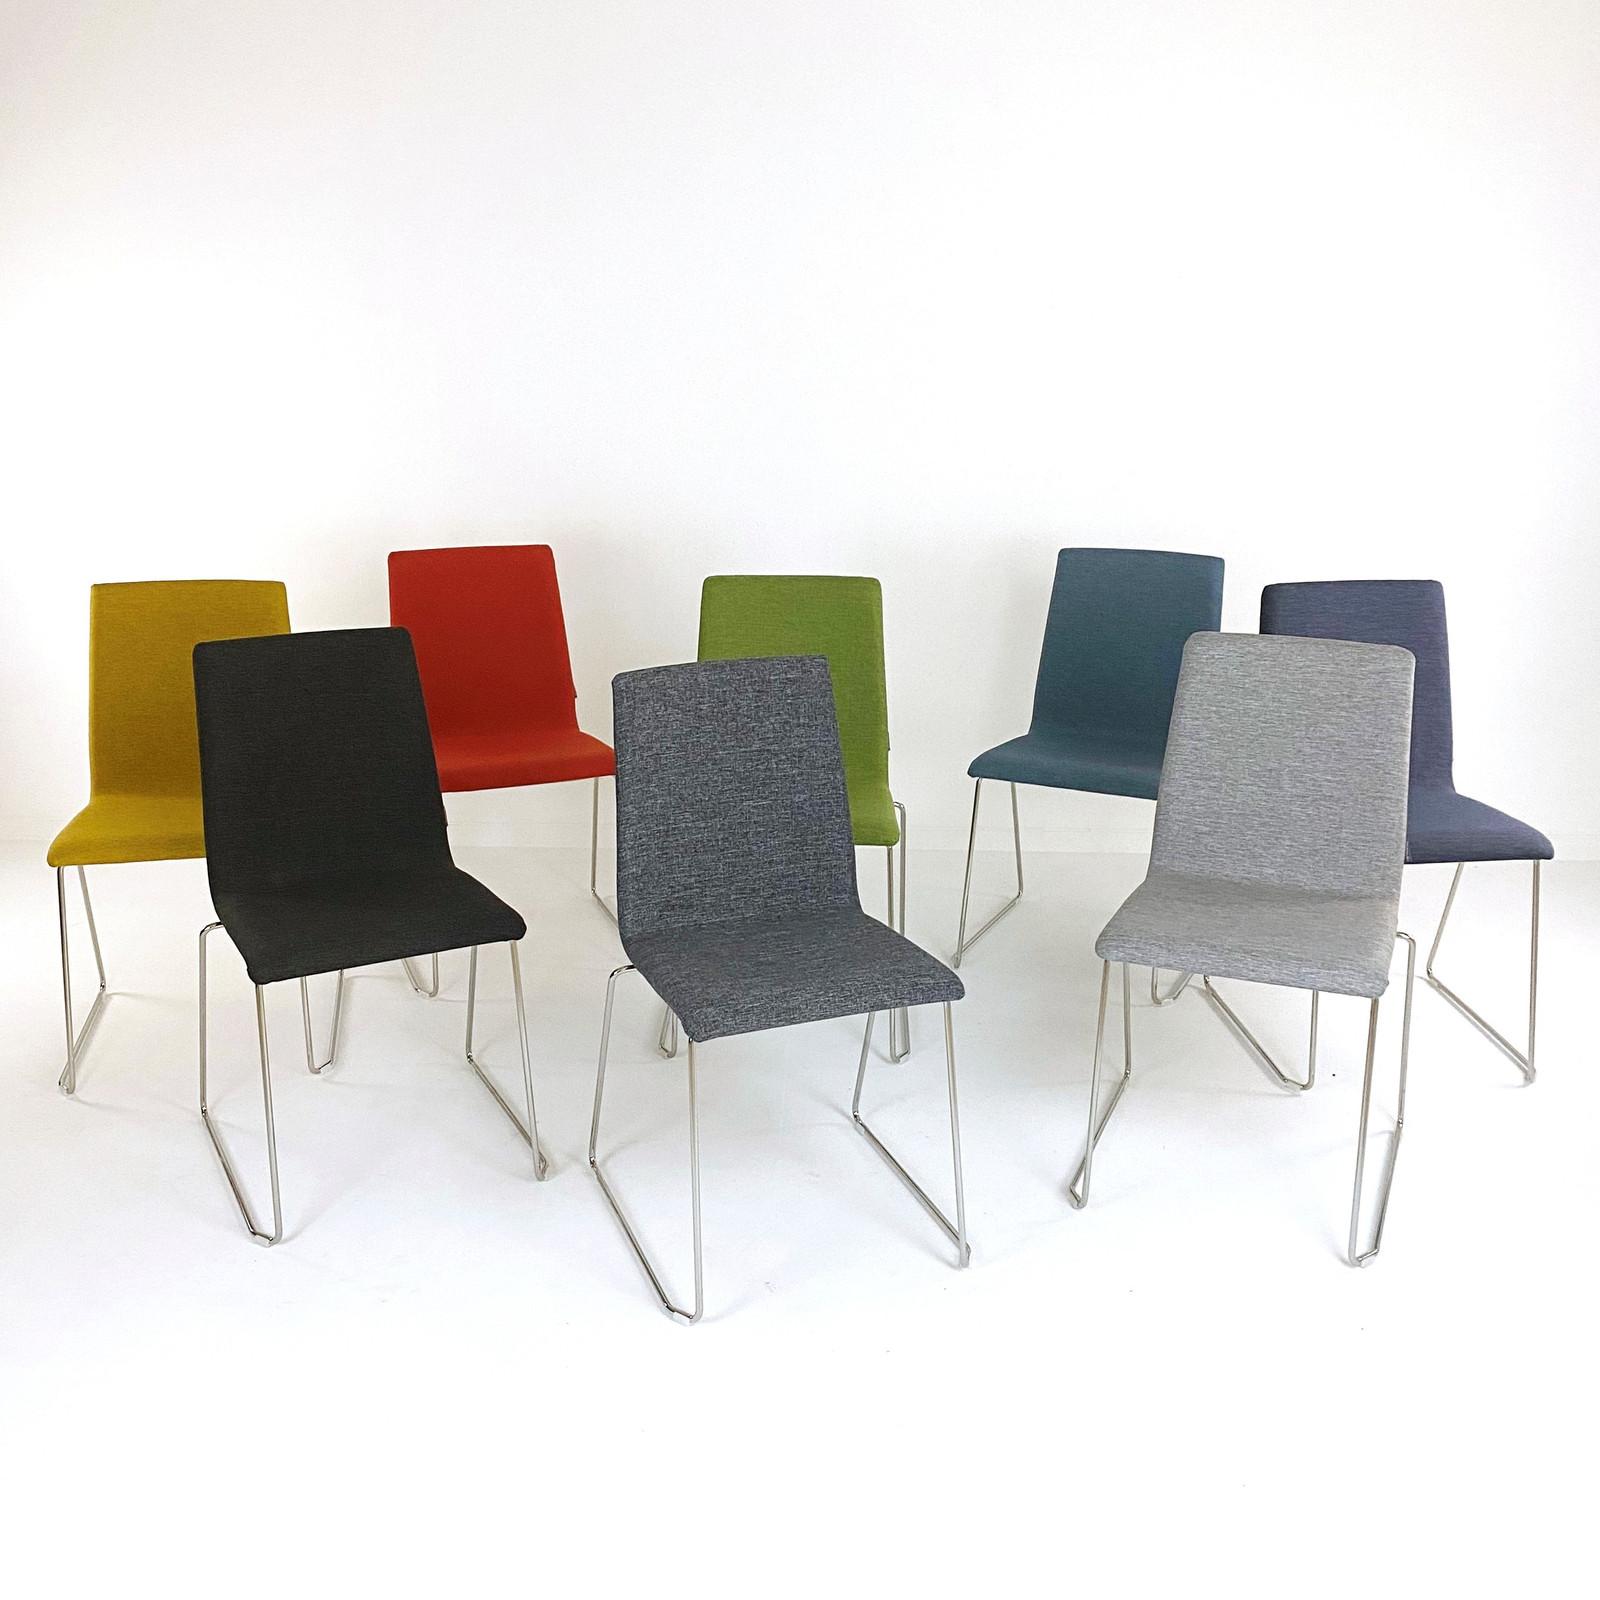 finn konferamserom stol